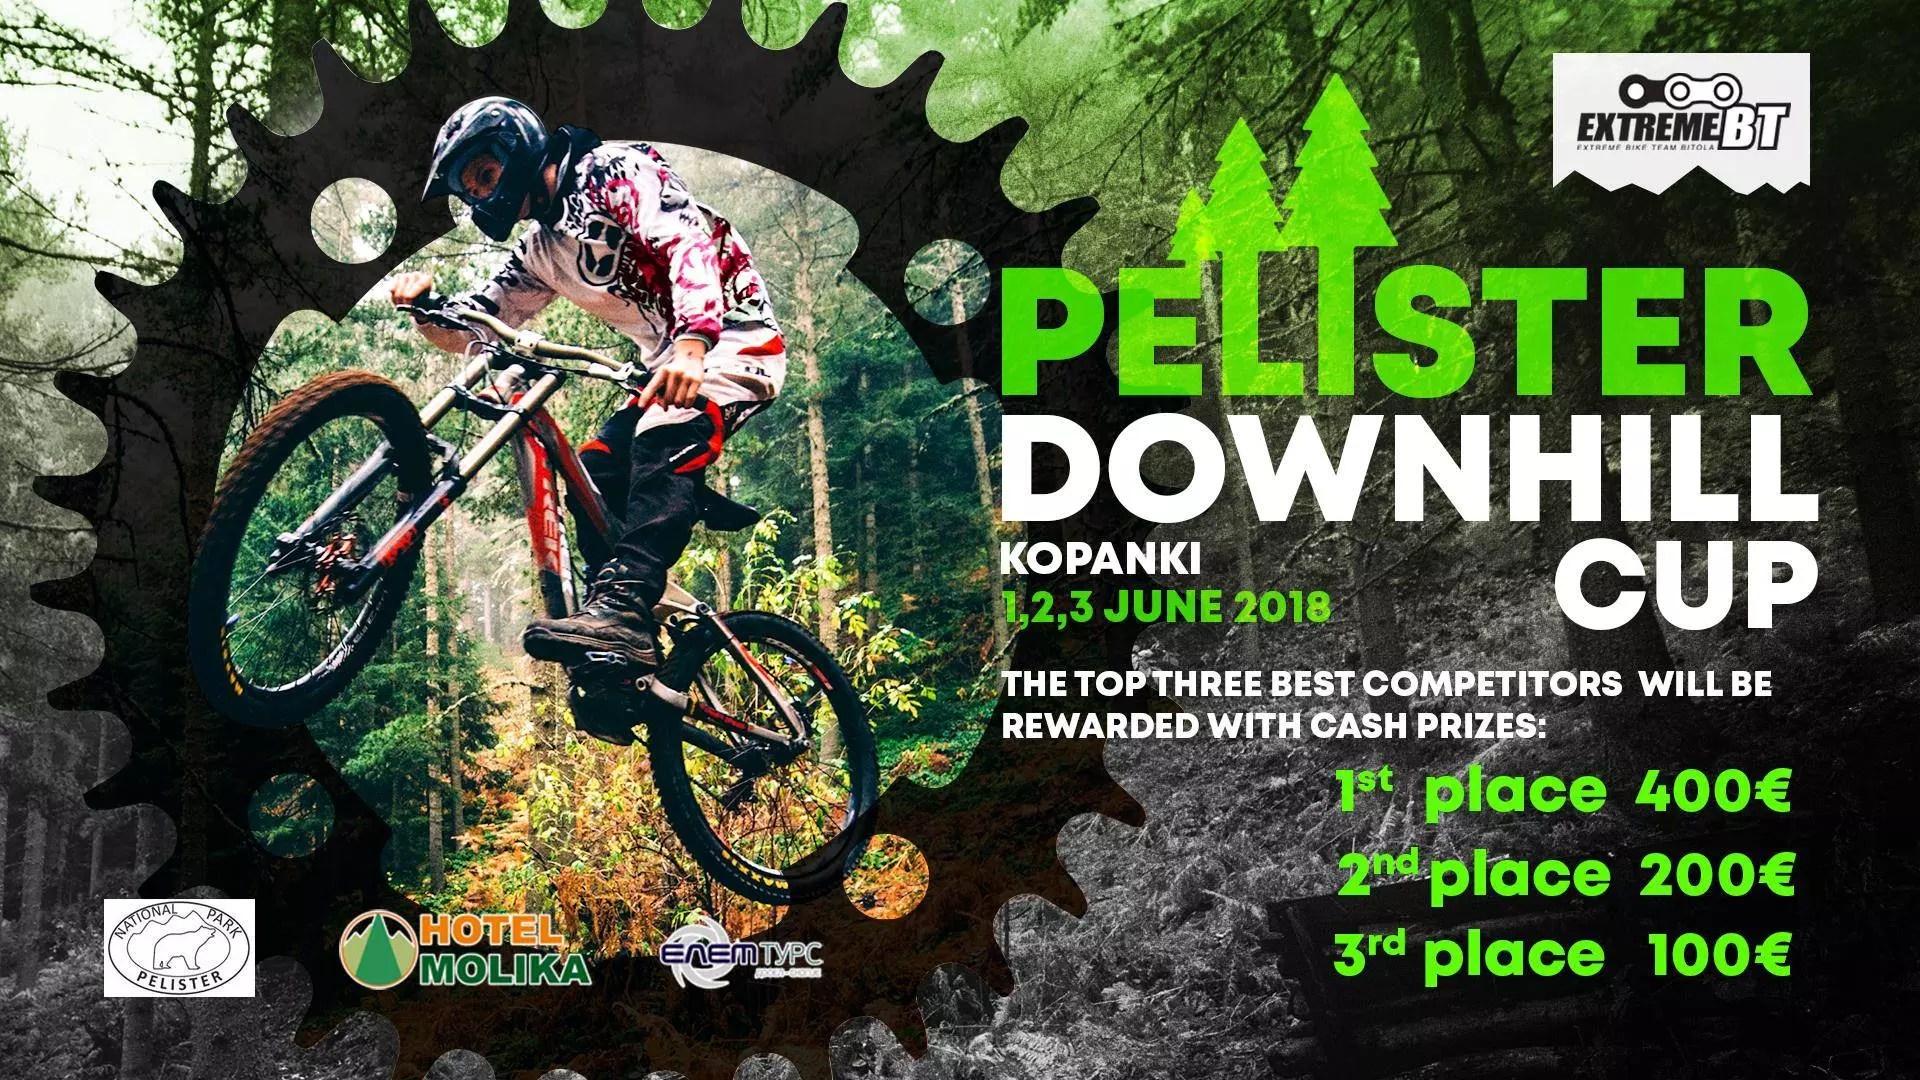 Pelister Downhill Cup No.6 - Kopanki 2018